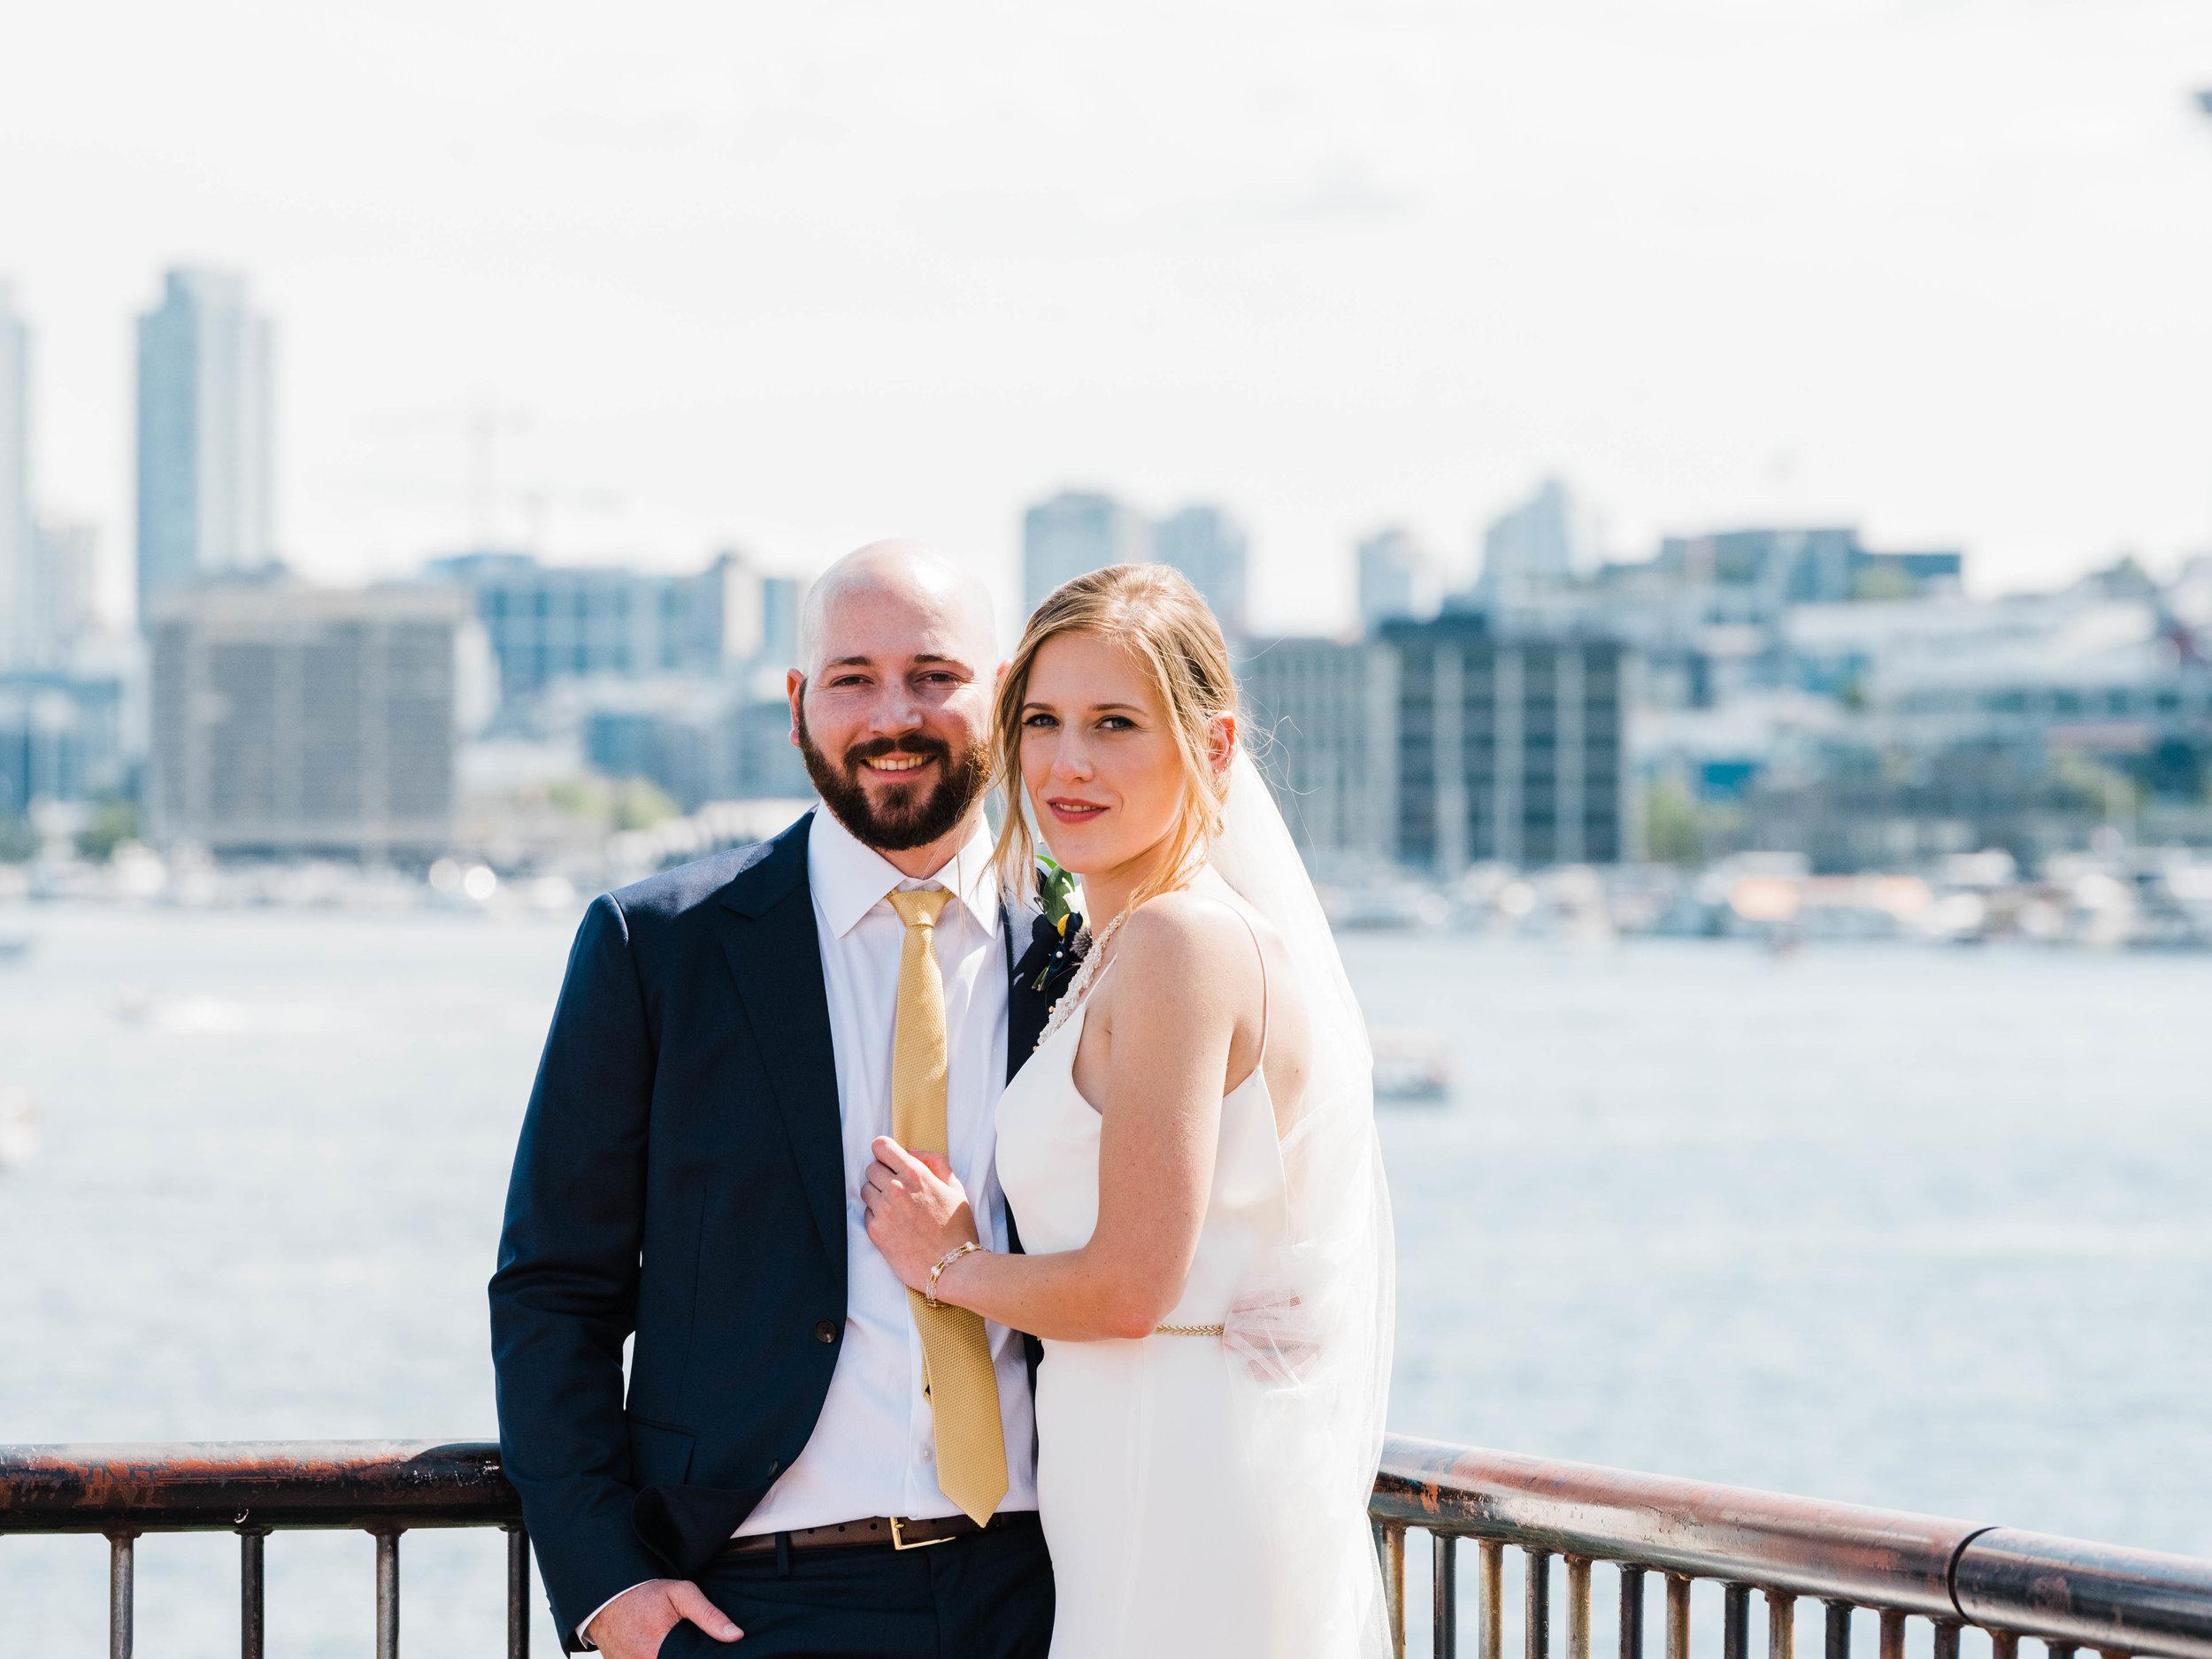 Seattle Wedding- MV Skansonia - Anna + Josh -  (910) - Copy.jpg